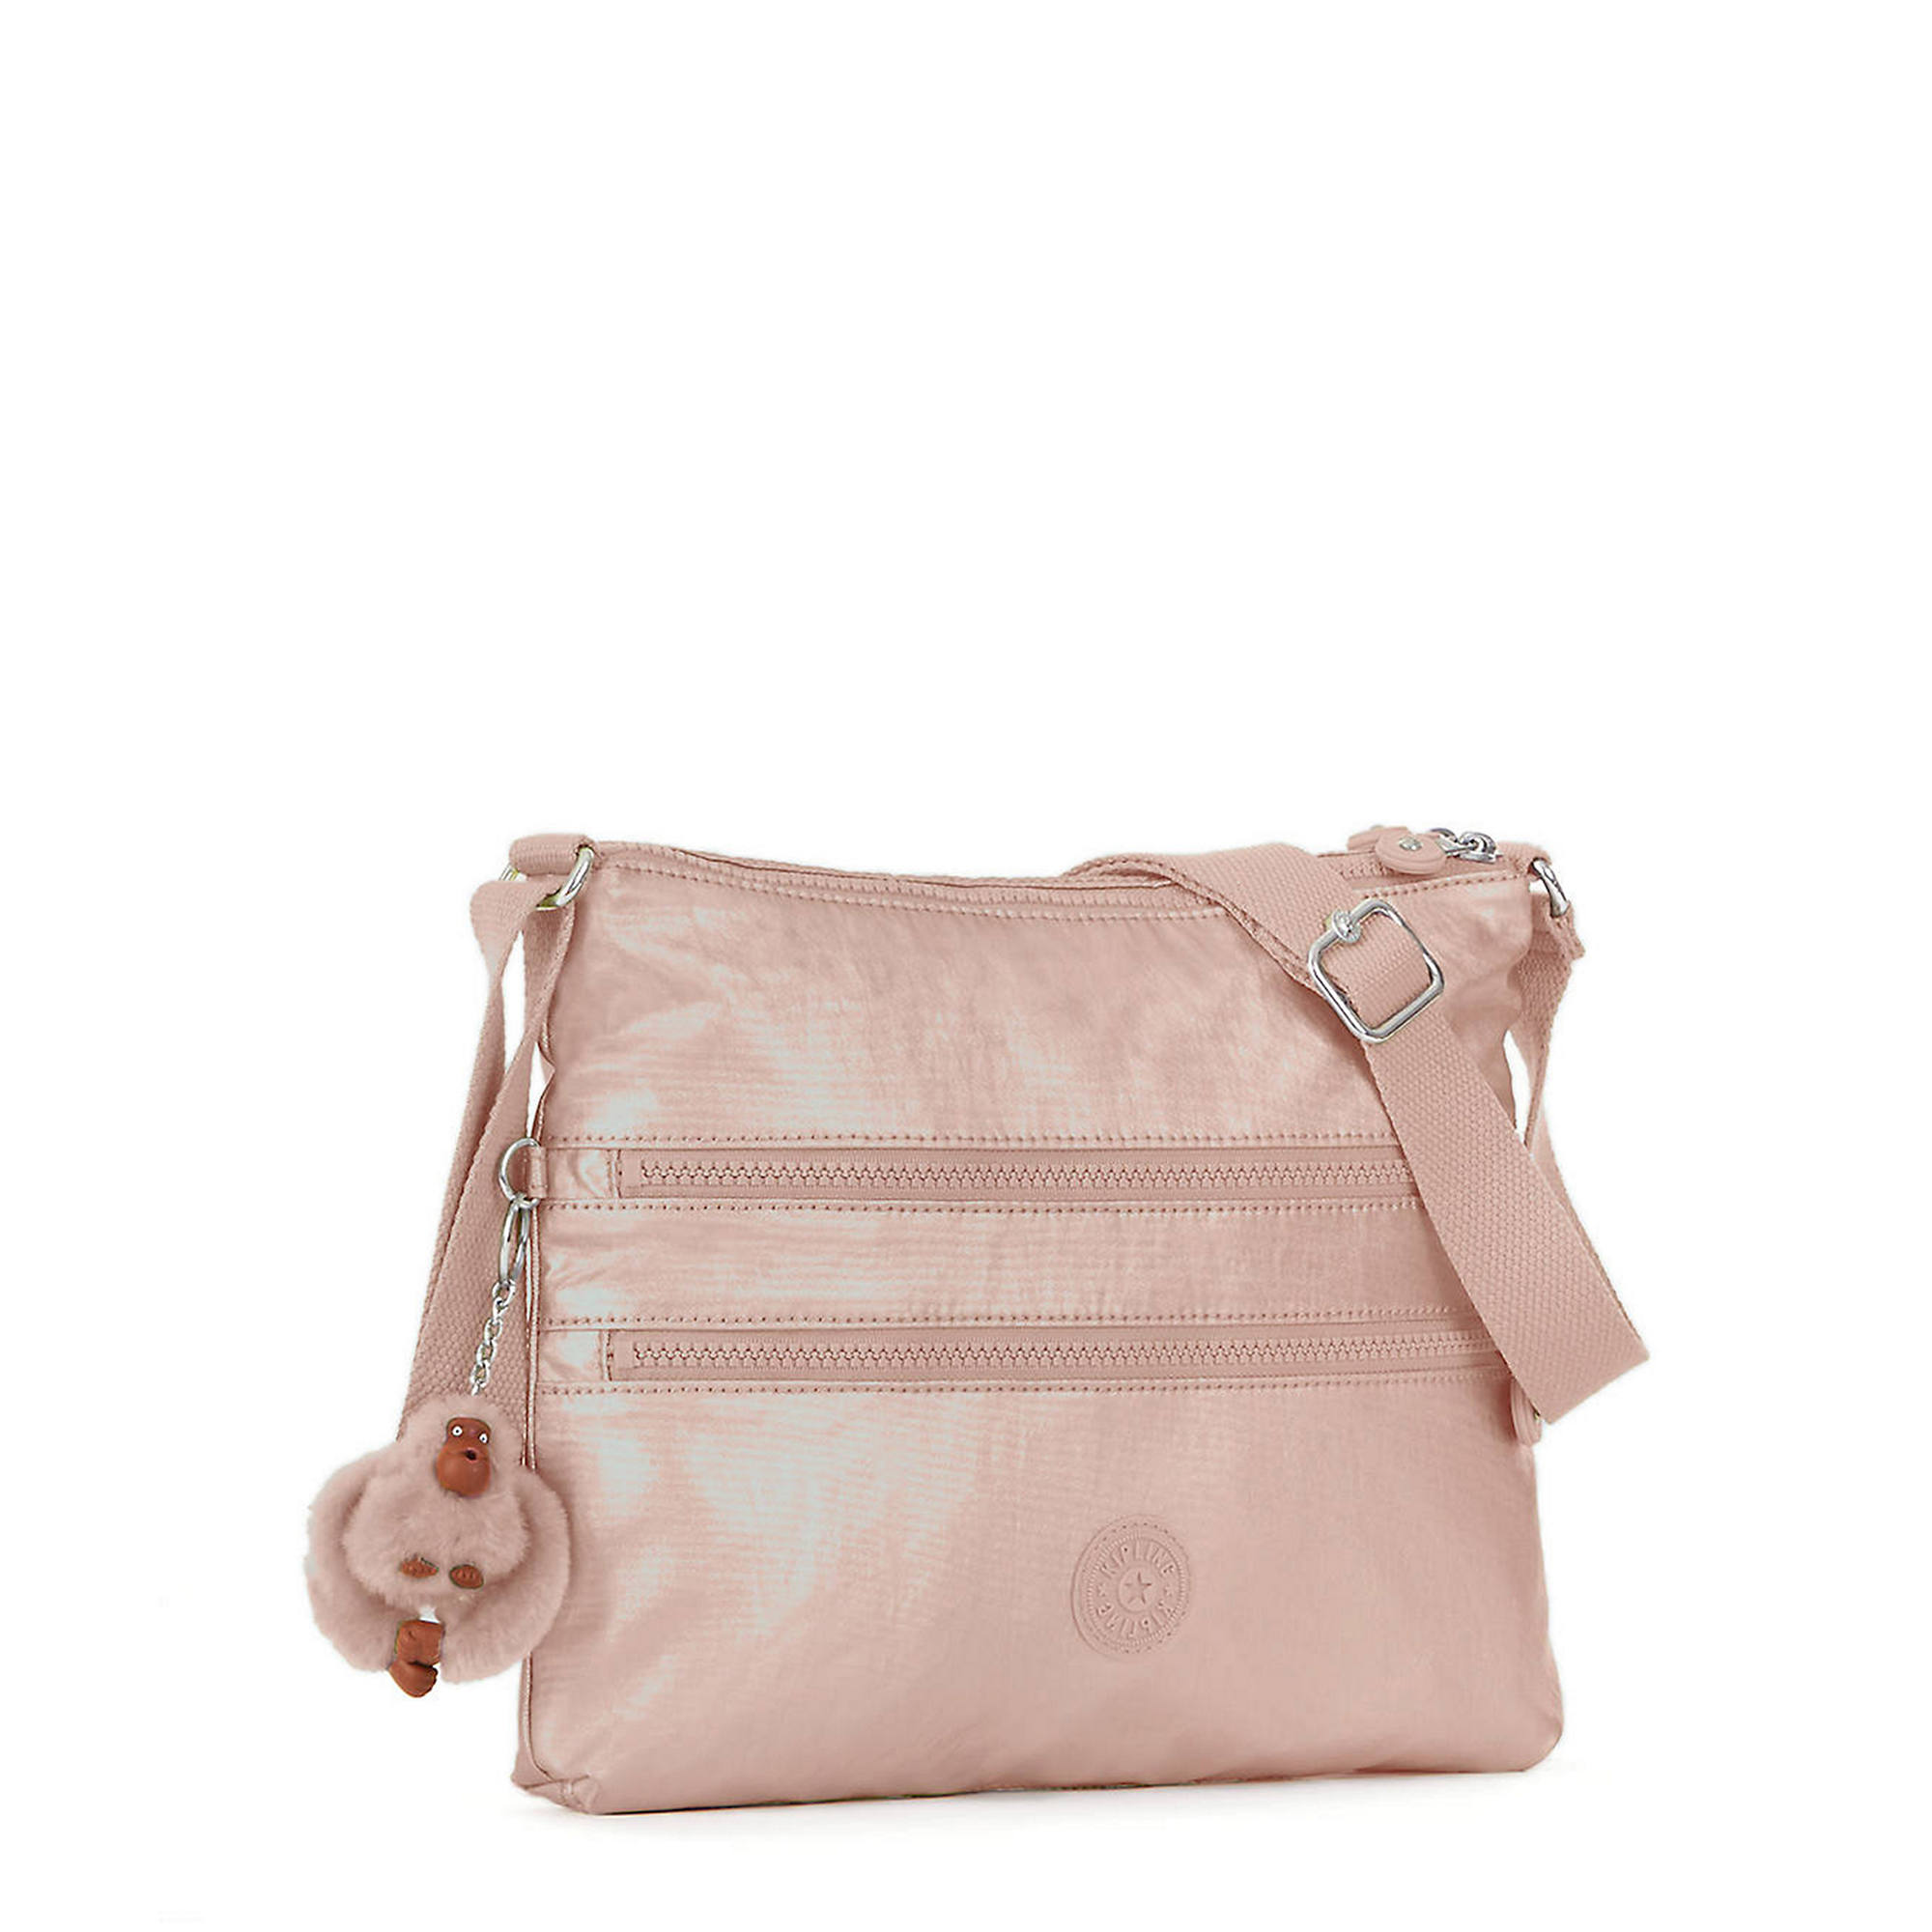 Kipling-Alvar-Metallic-Crossbody-Bag miniature 35